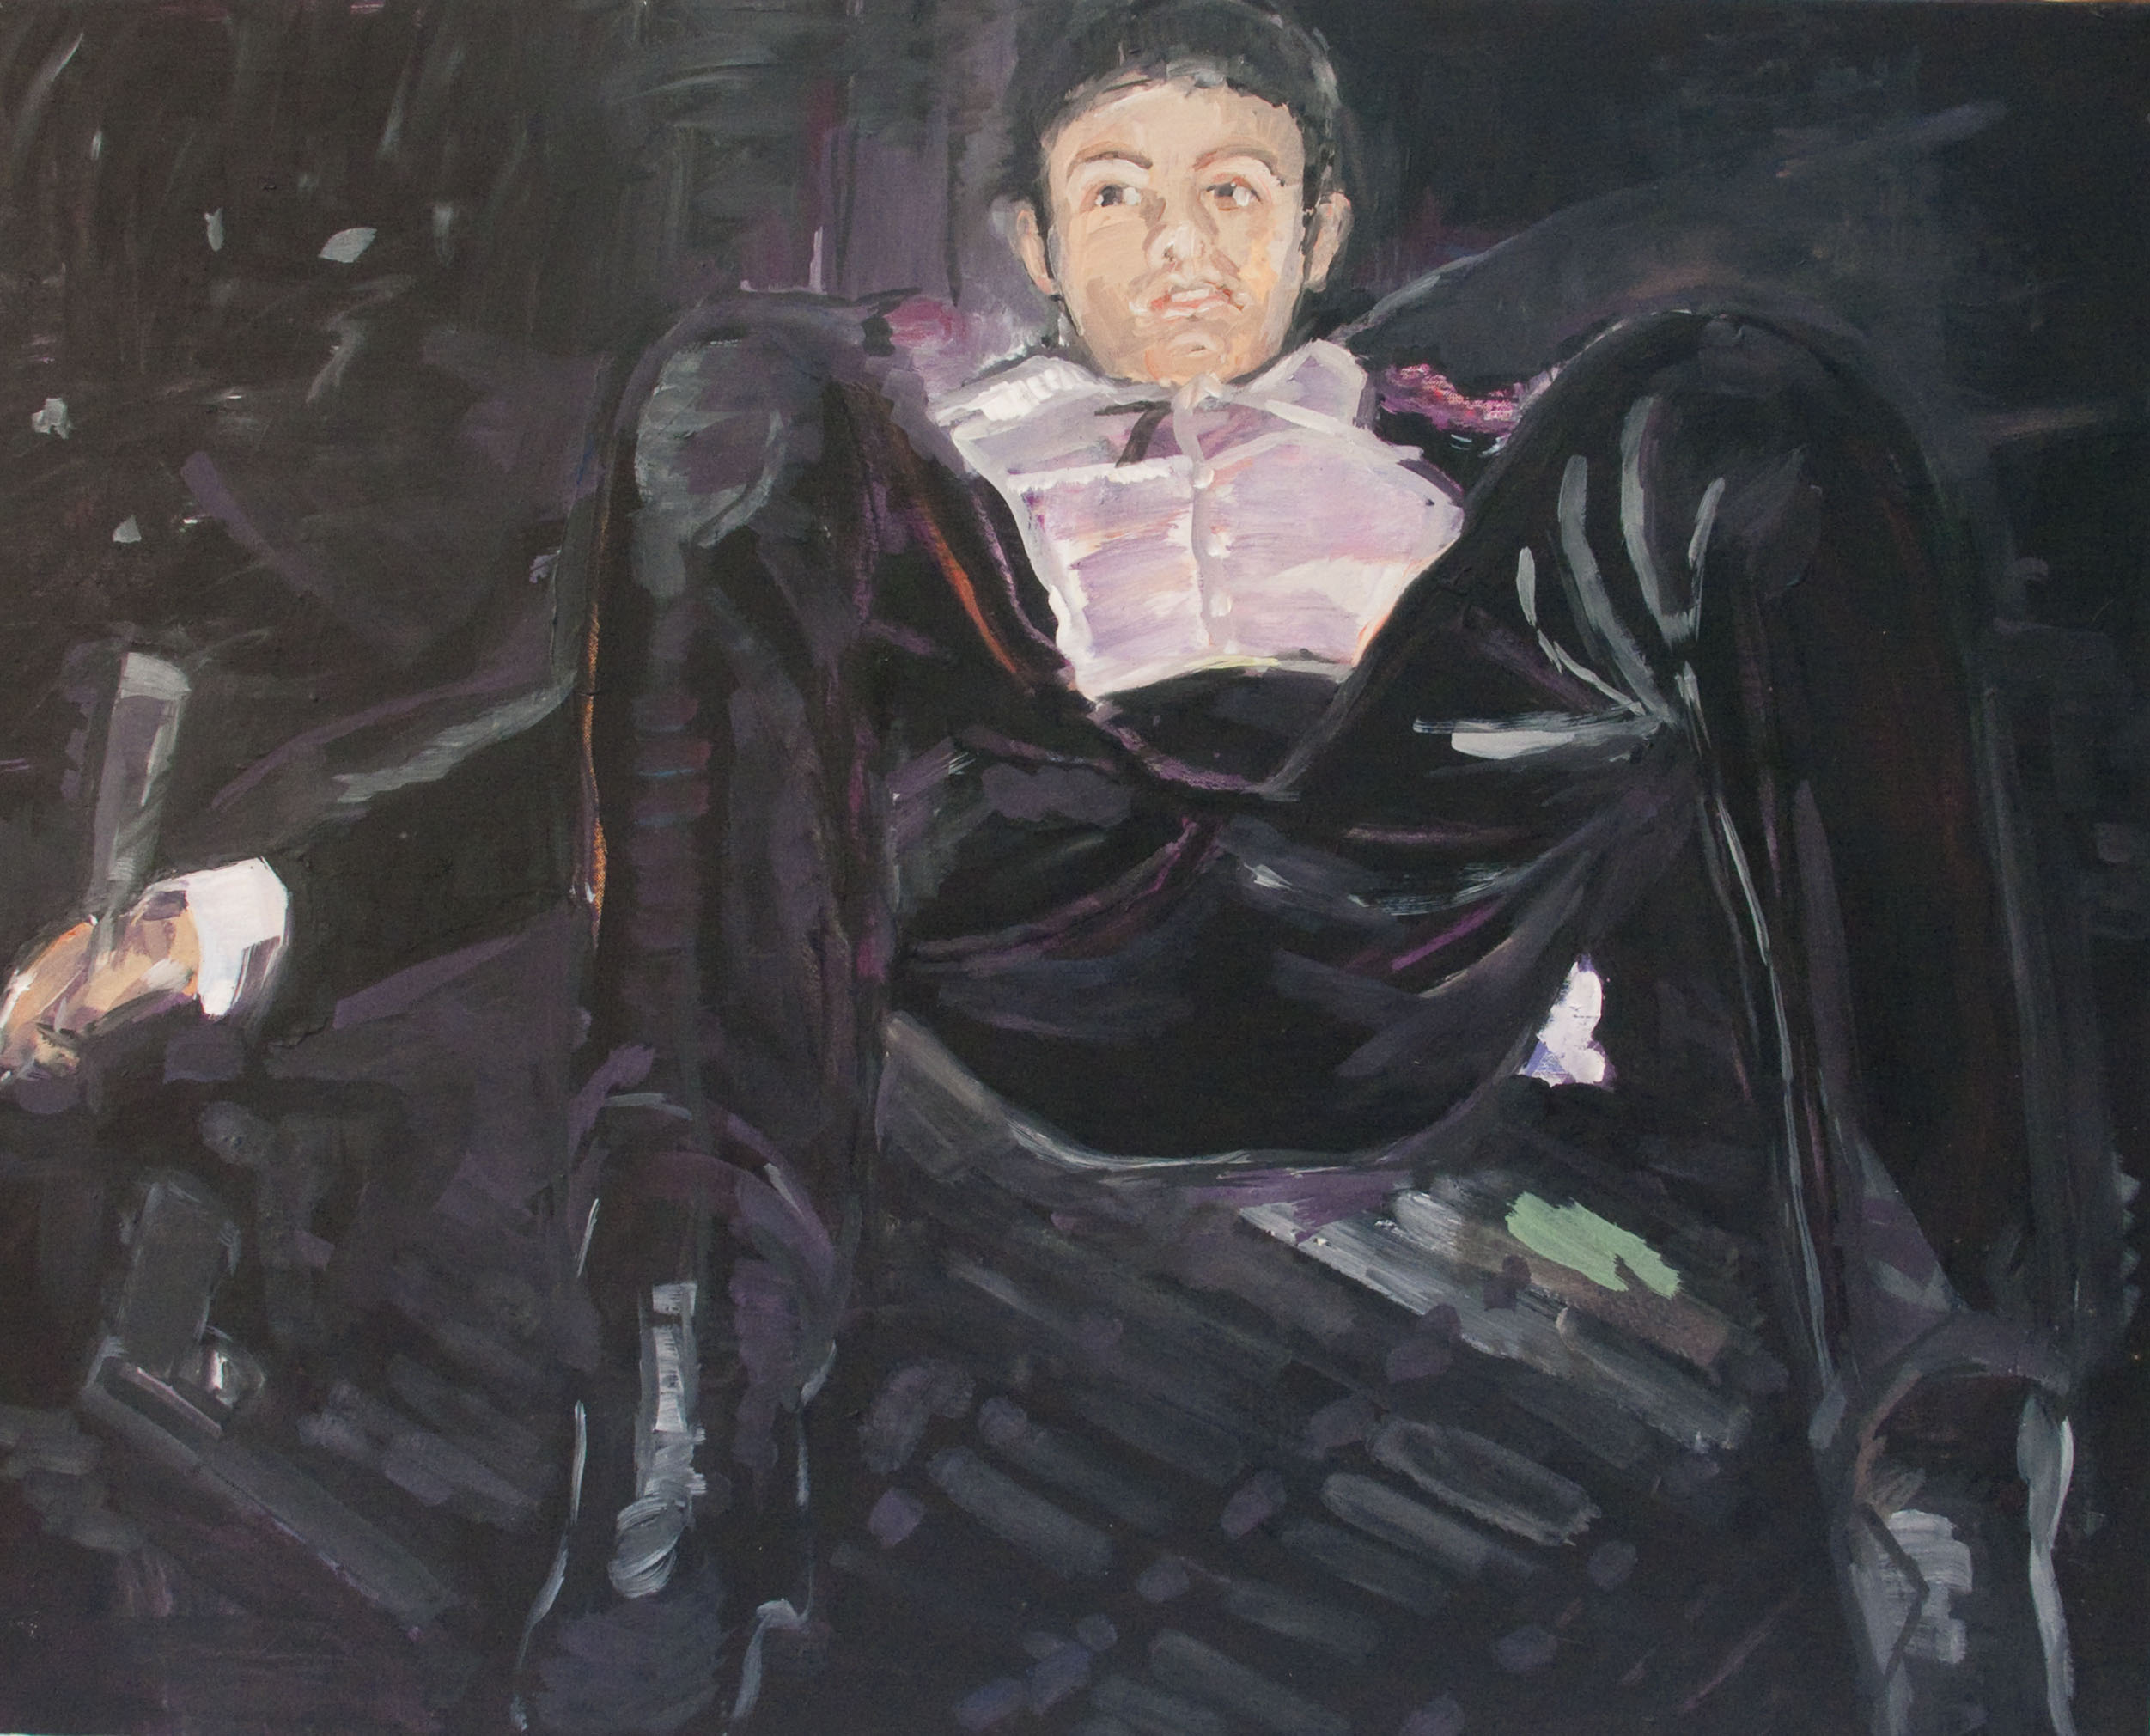 Sex Addict (Julian), olej napłótnie, 80 x 100 cm, 2013